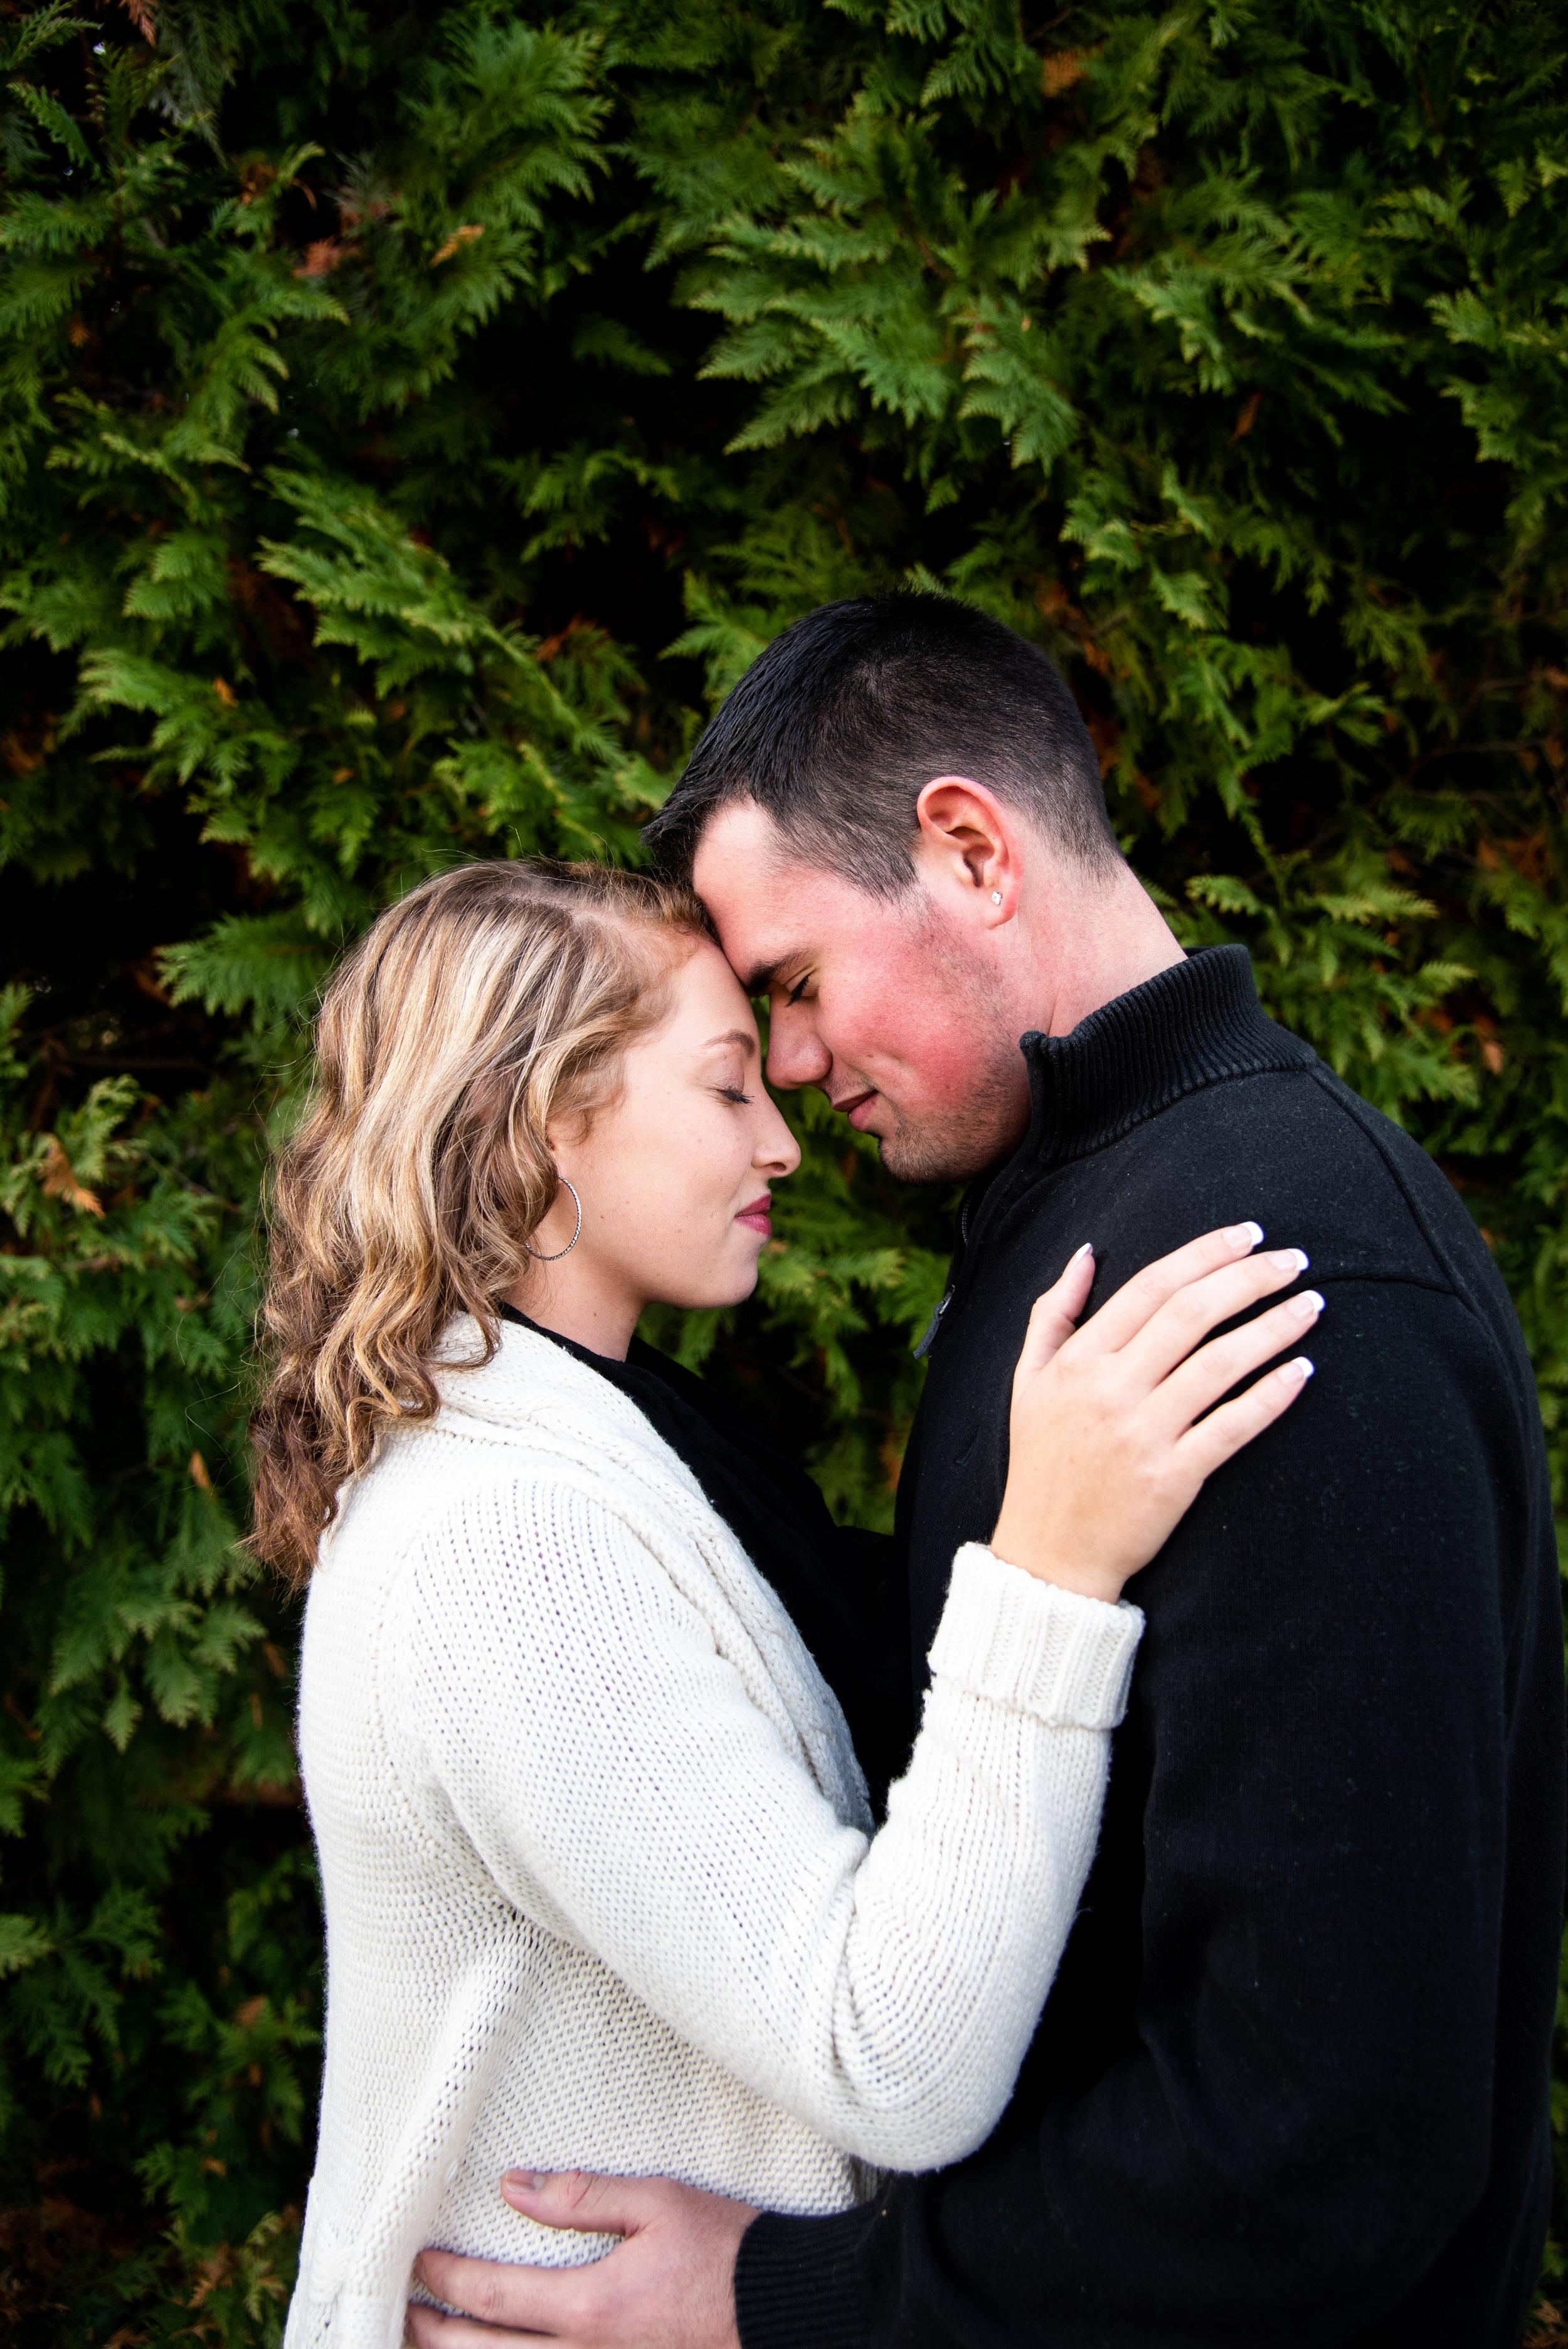 Kyla Jo Photography Muncie Indiana Photographer couple anniversary photography